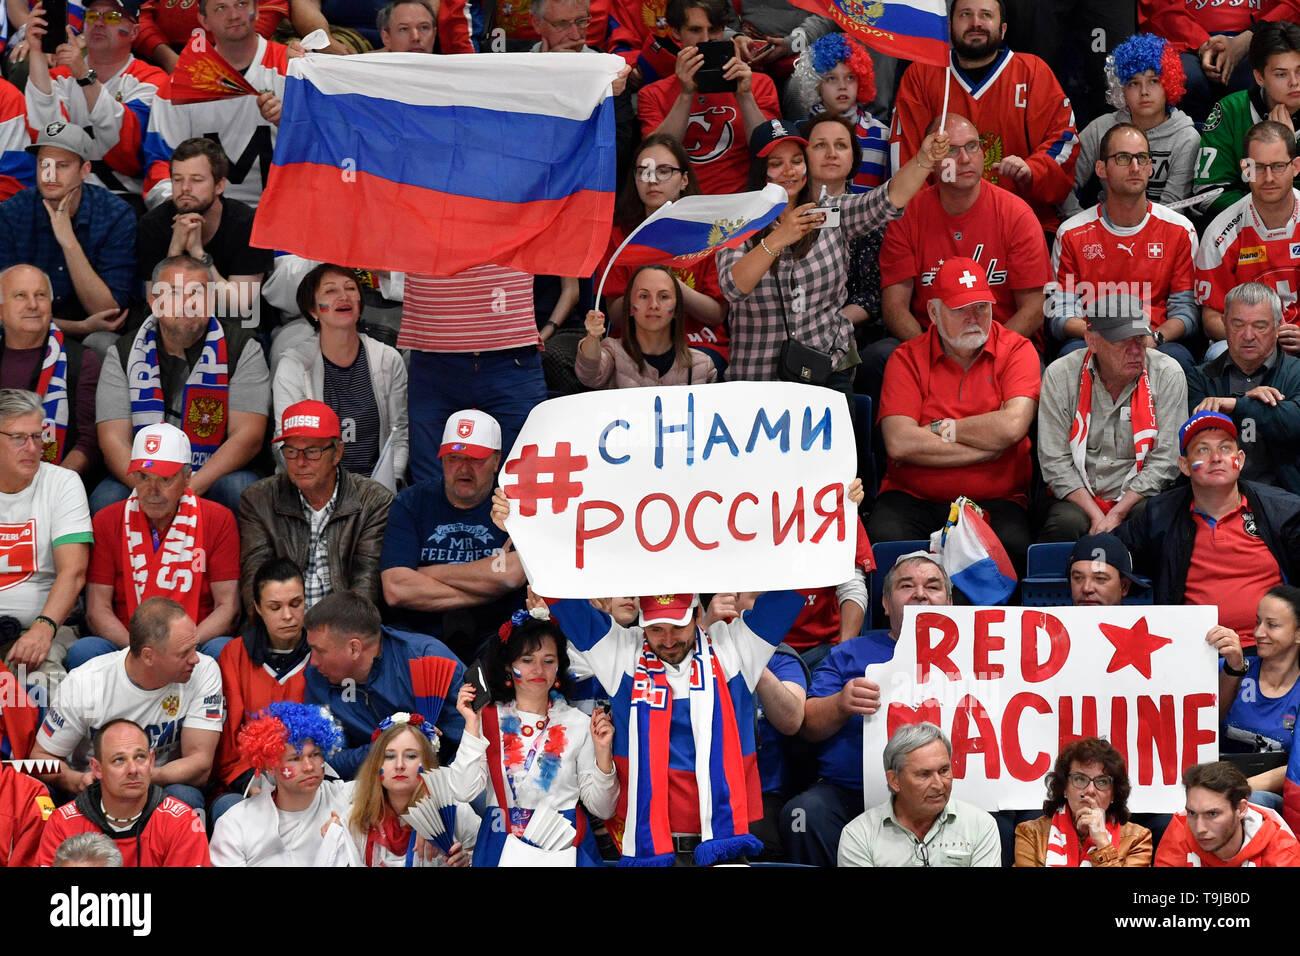 Bratislava, Slovakia. 19th May, 2019. Russian fans during the match between Switzerland and Russia within the 2019 IIHF World Championship in Bratislava, Slovakia, on May 19, 2019. Credit: Vit Simanek/CTK Photo/Alamy Live News Stock Photo